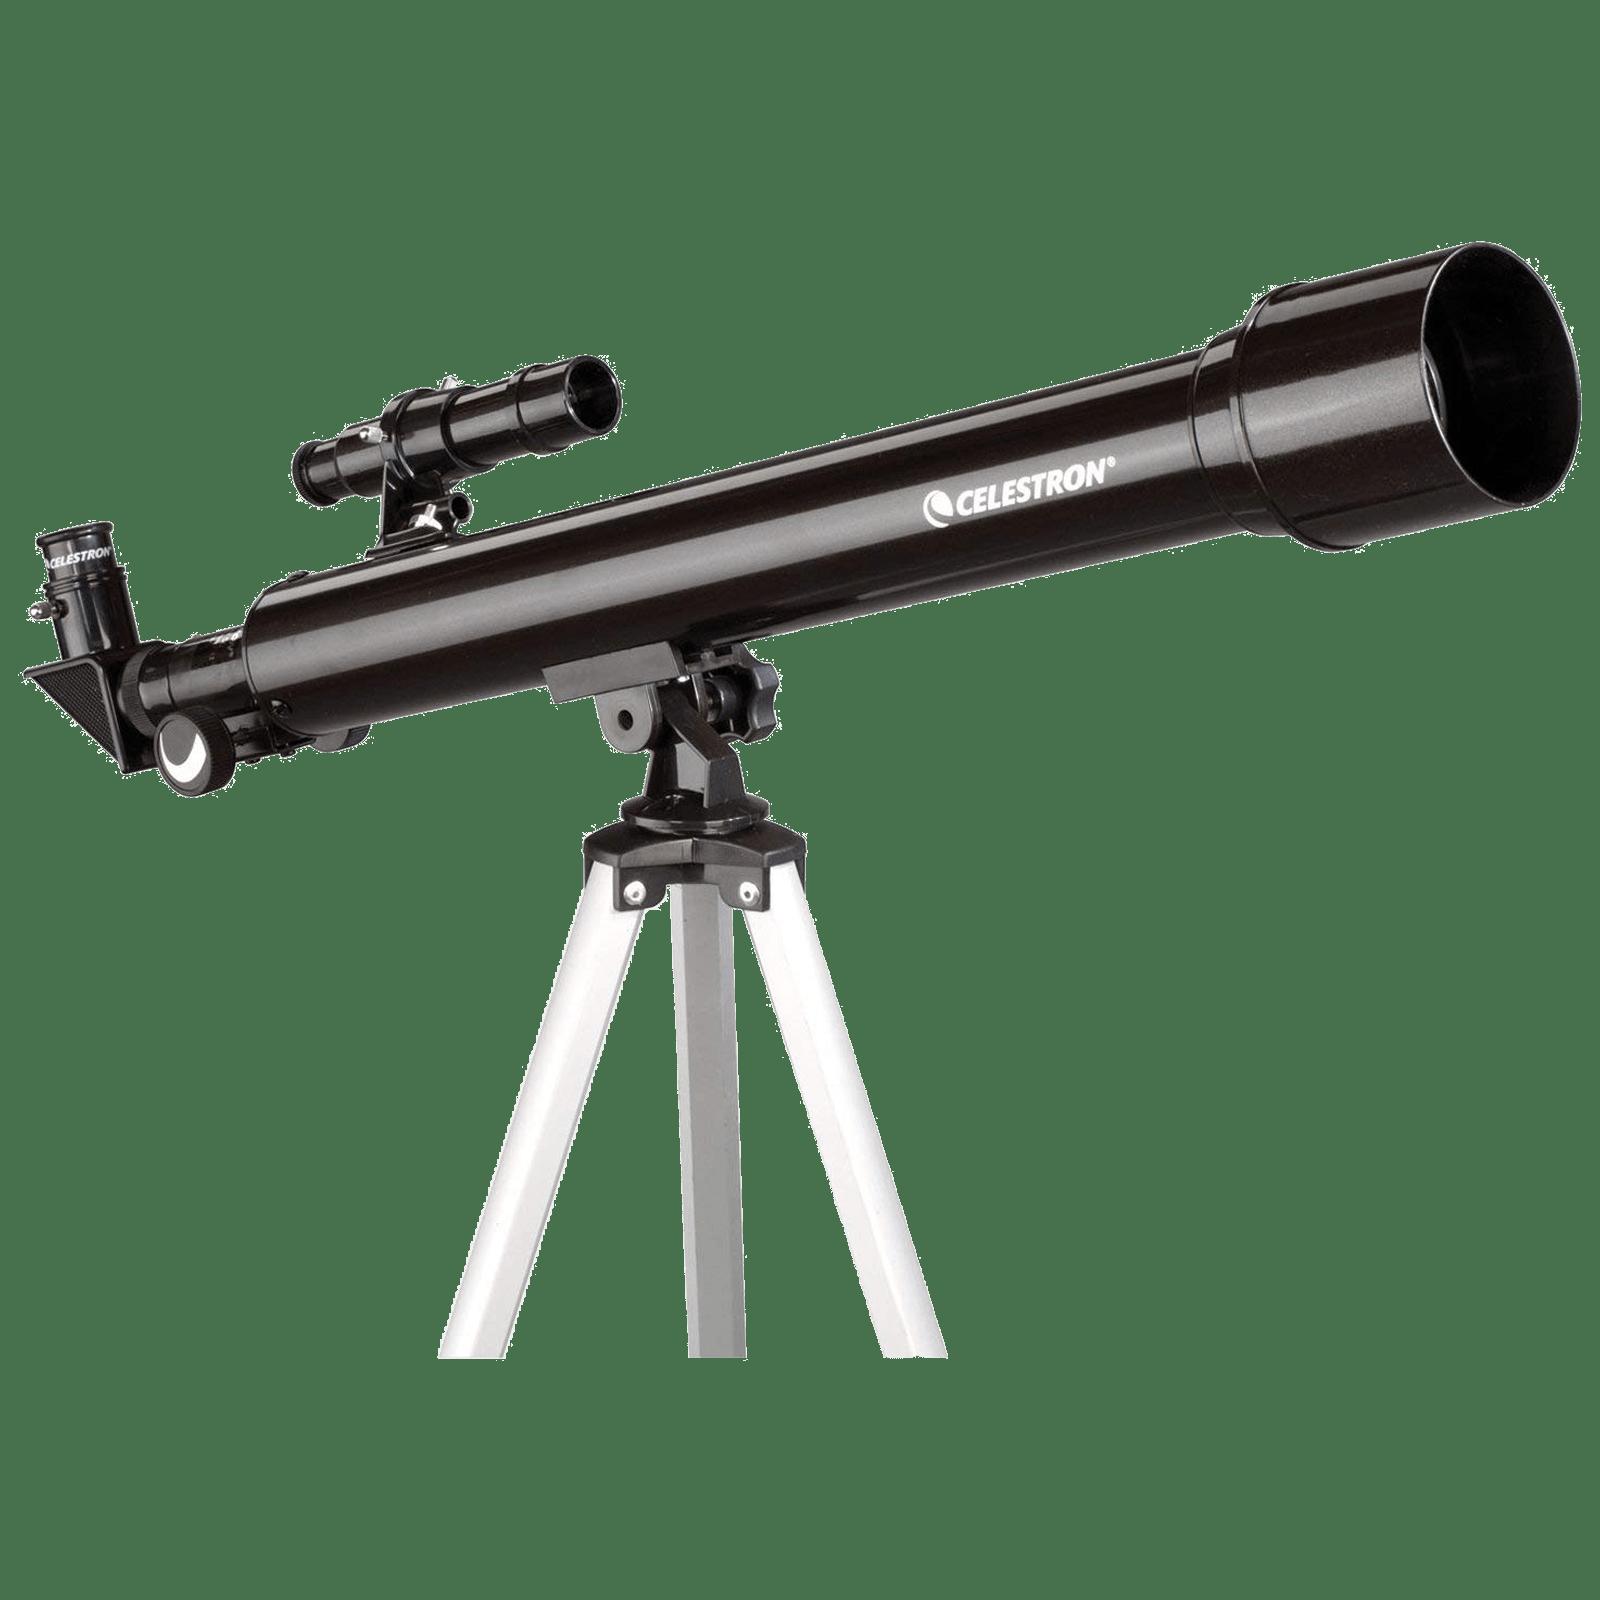 Celestron Powerseeker 50AZ 118x 20mm Telescope (Manual Alt-Azimuth Mount, 21039-DS, Black)